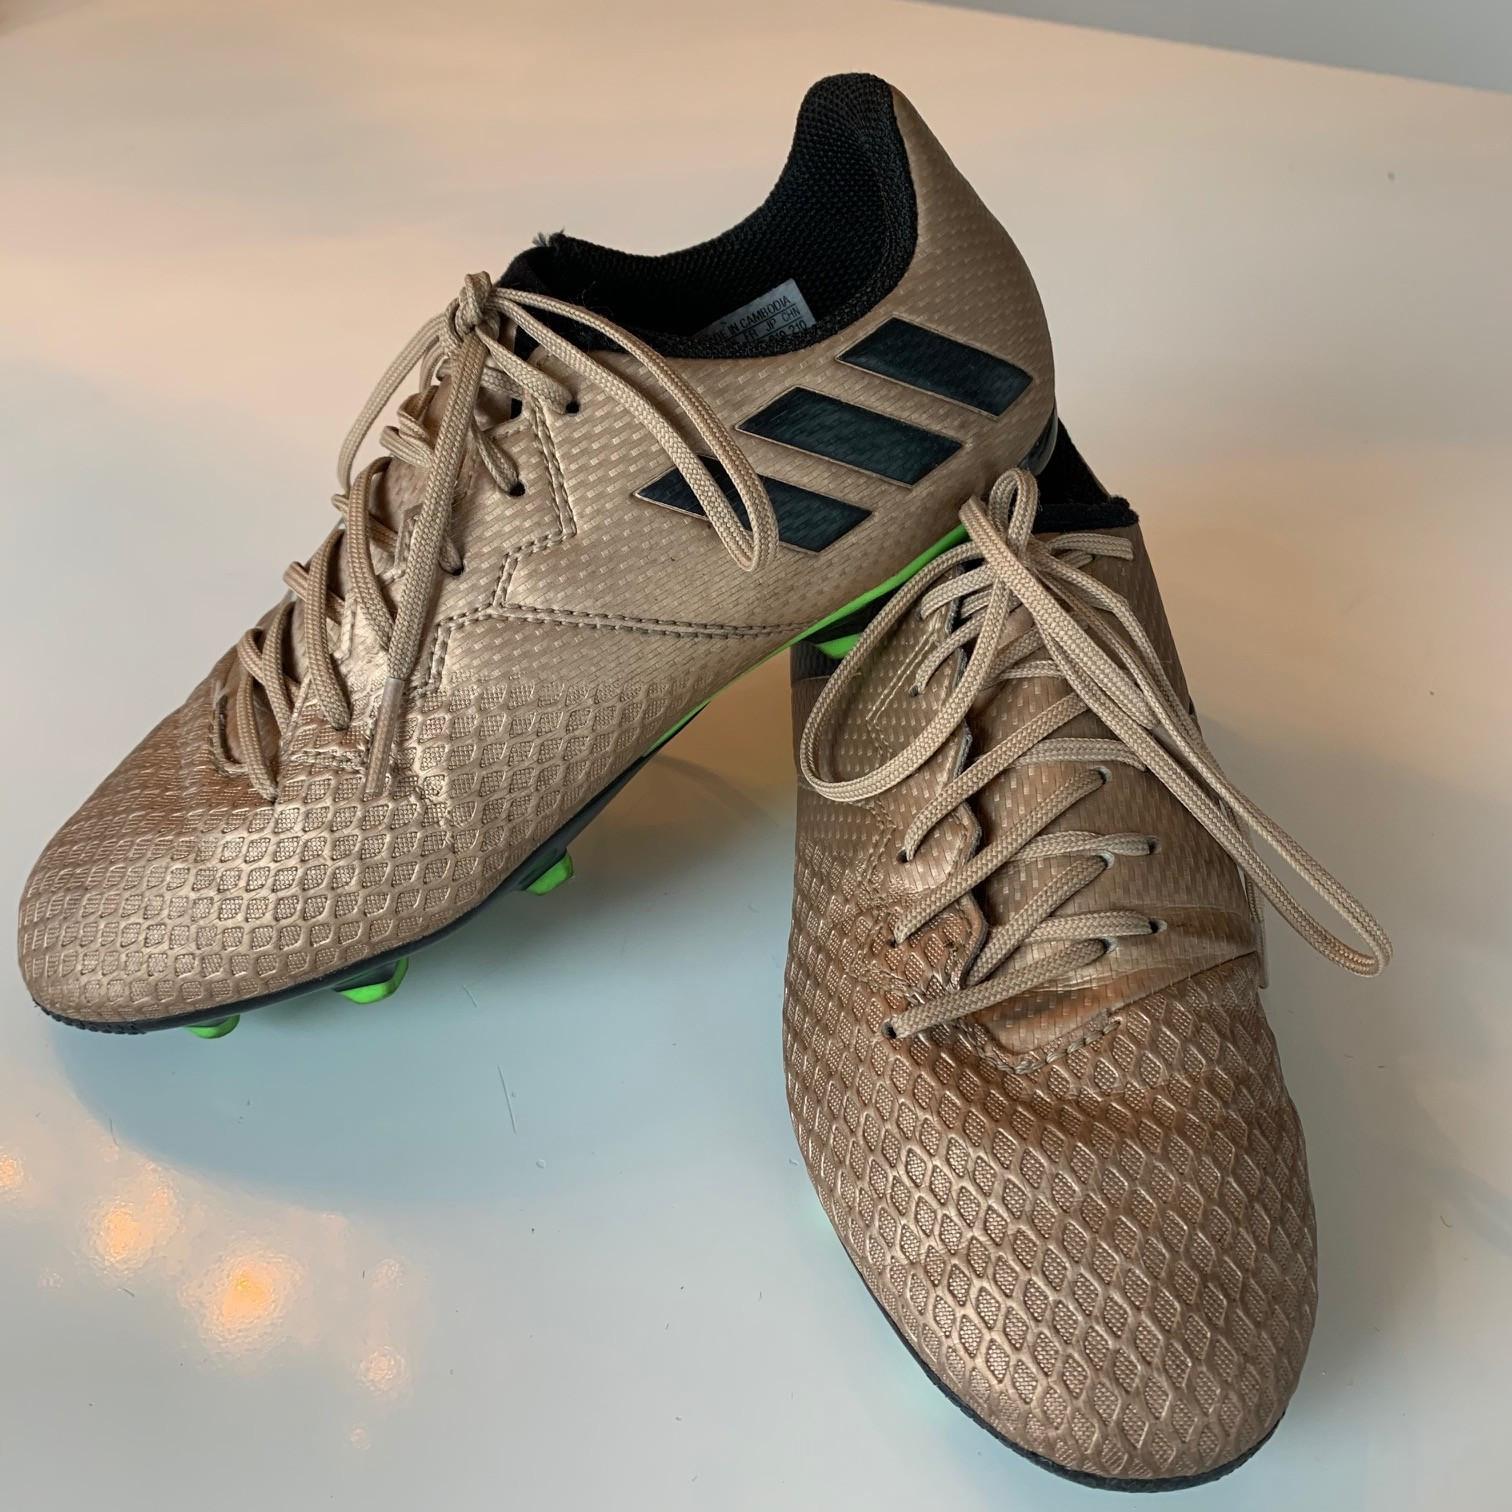 Fotballsko: Adidas Messi 16.3 gull str. 34 | FINN.no